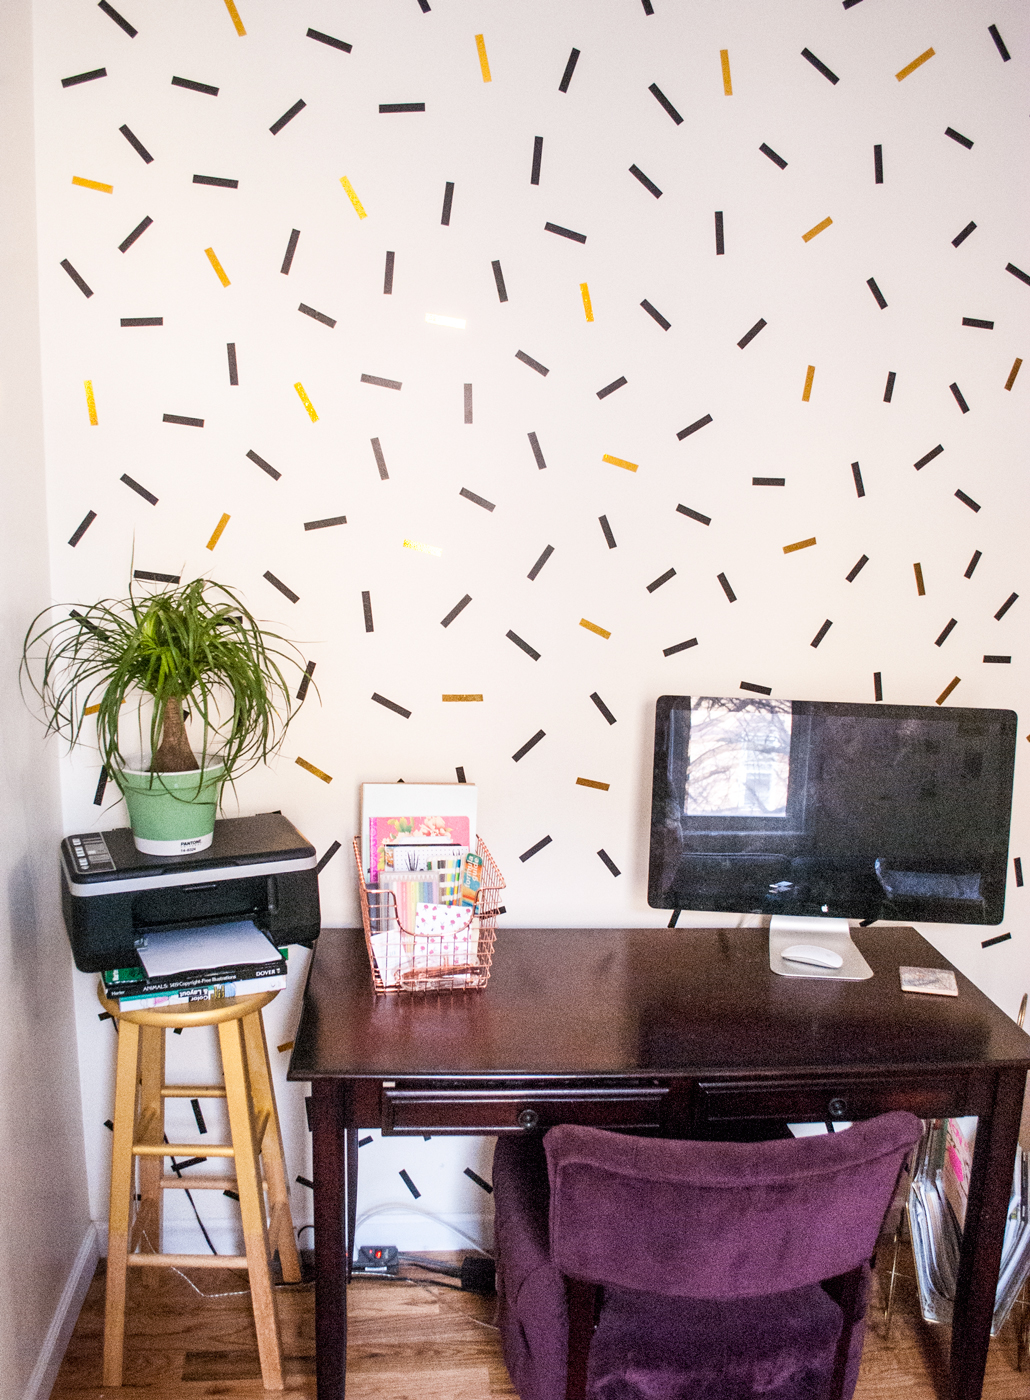 DIY oversized confetti mural | freckleandfair.com